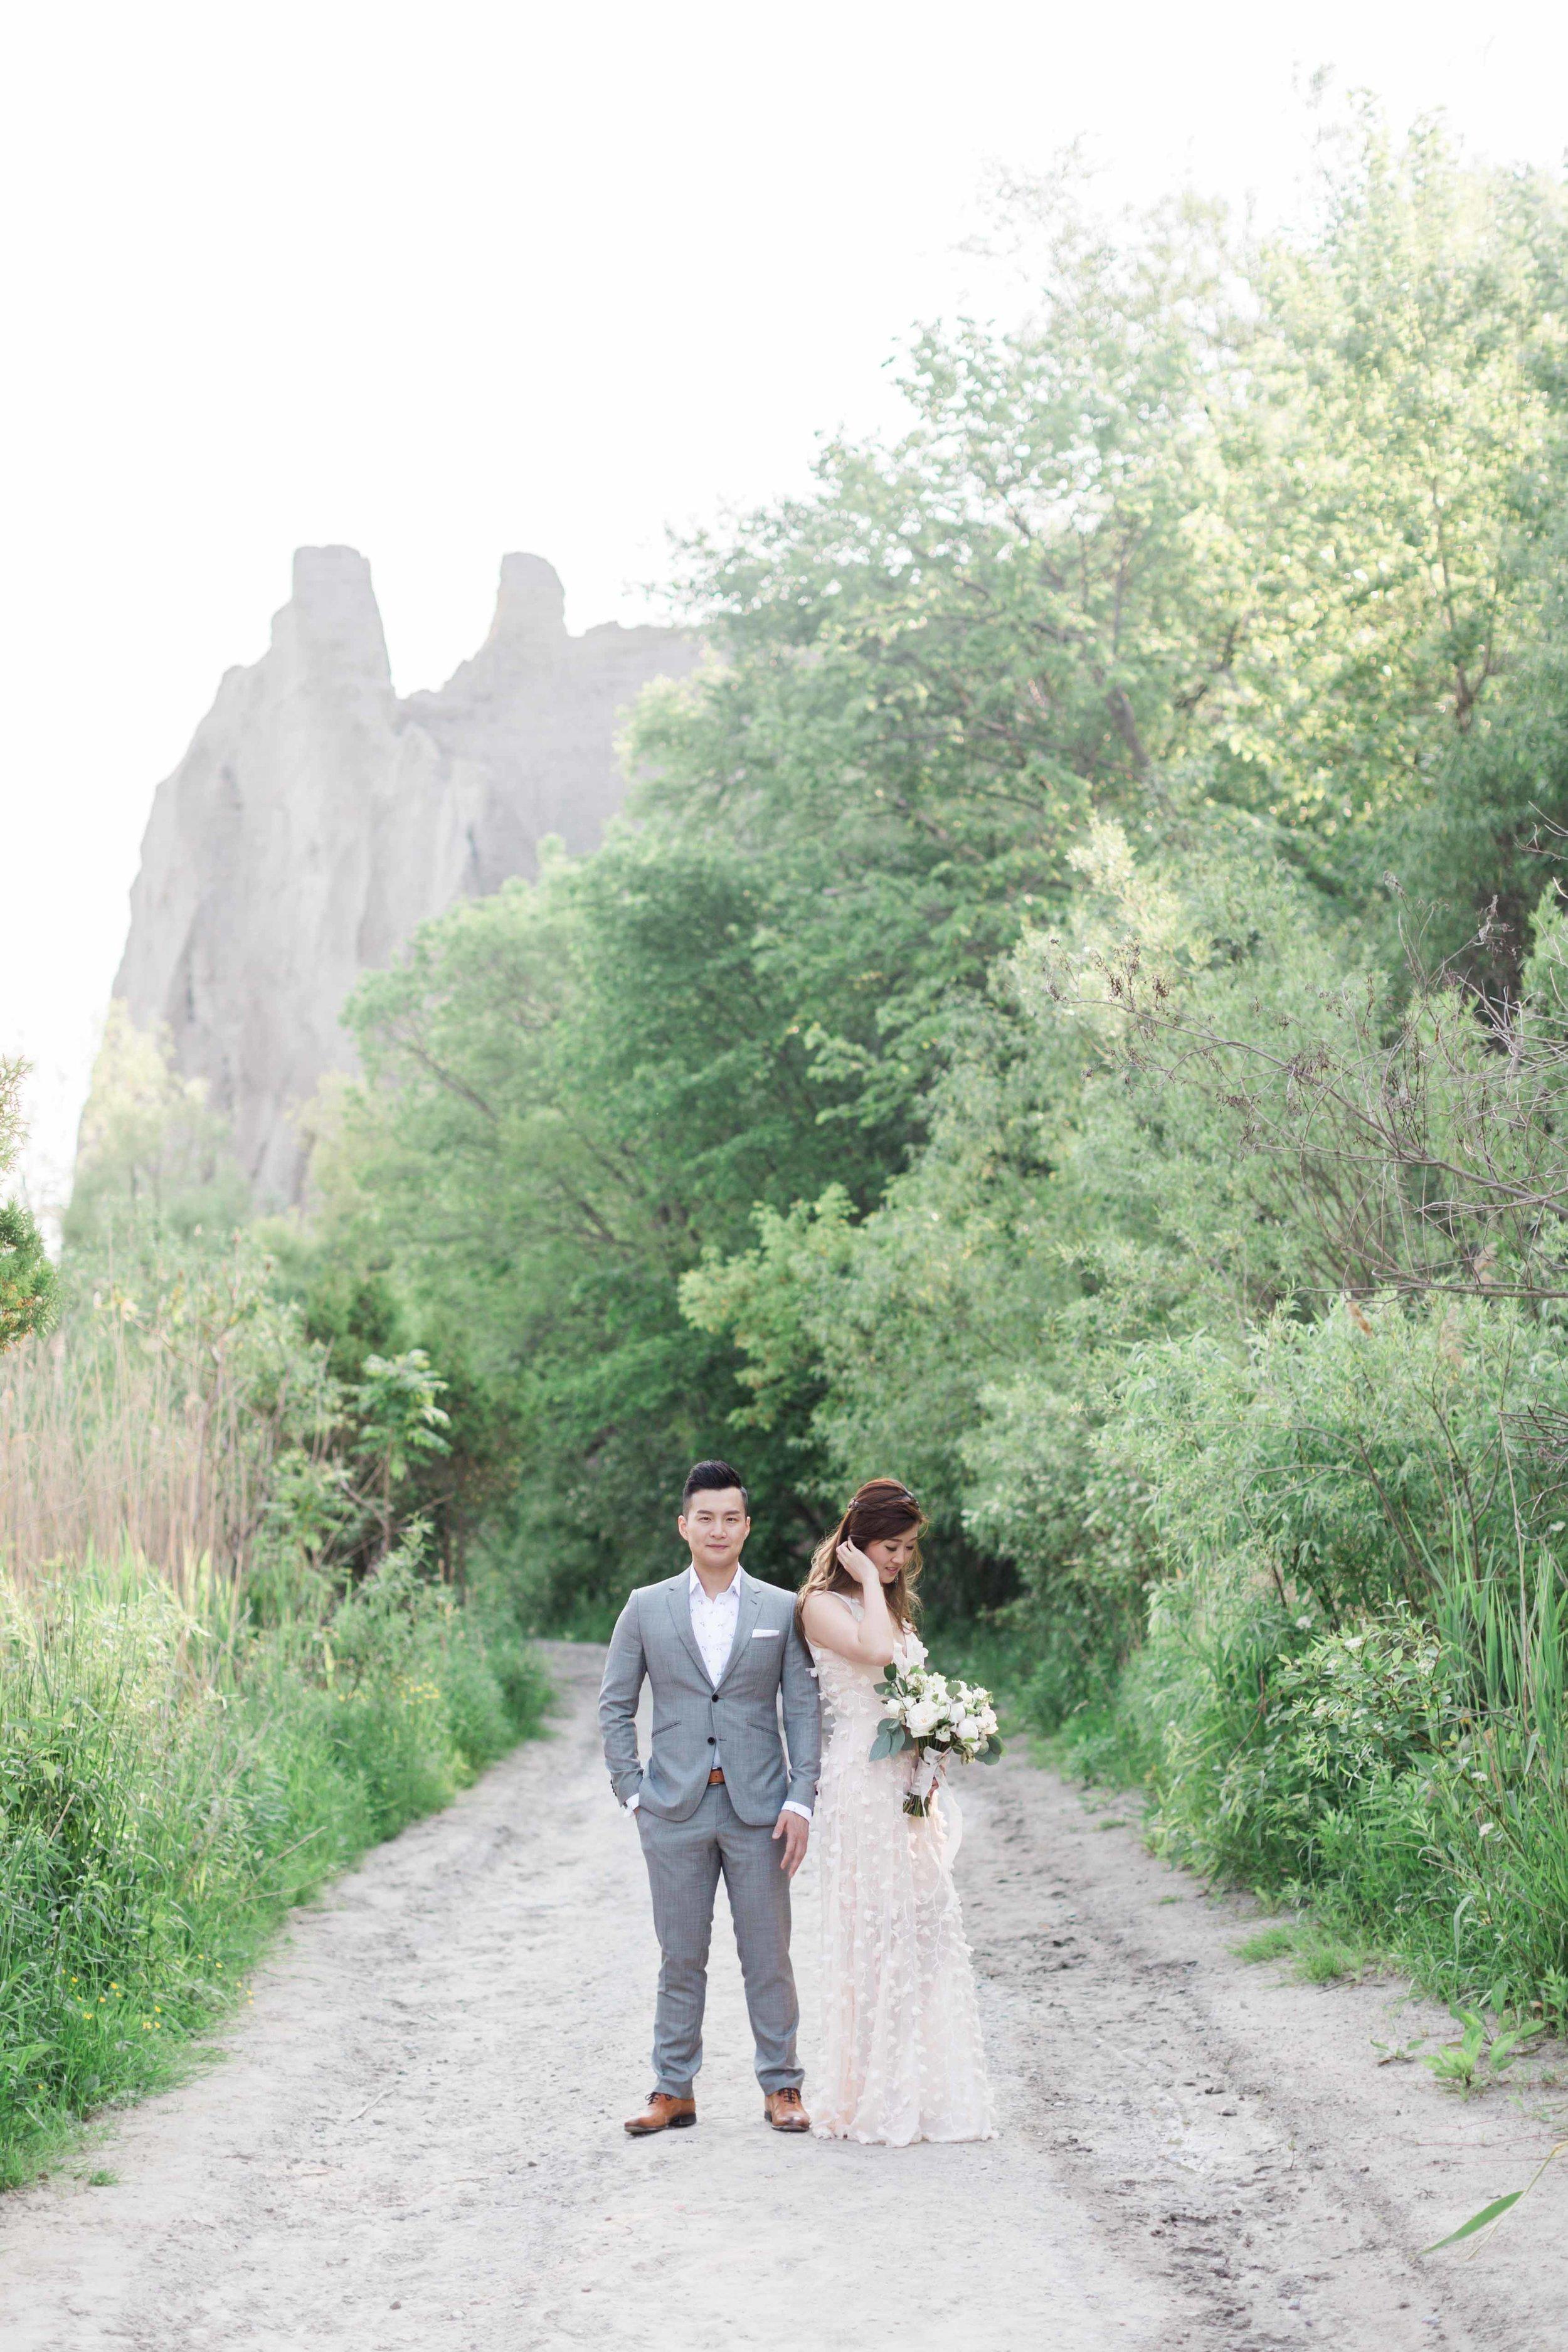 Cari Zhu Fine Art Photographer - Scarborough Bluffs Engagement Session-3.jpg